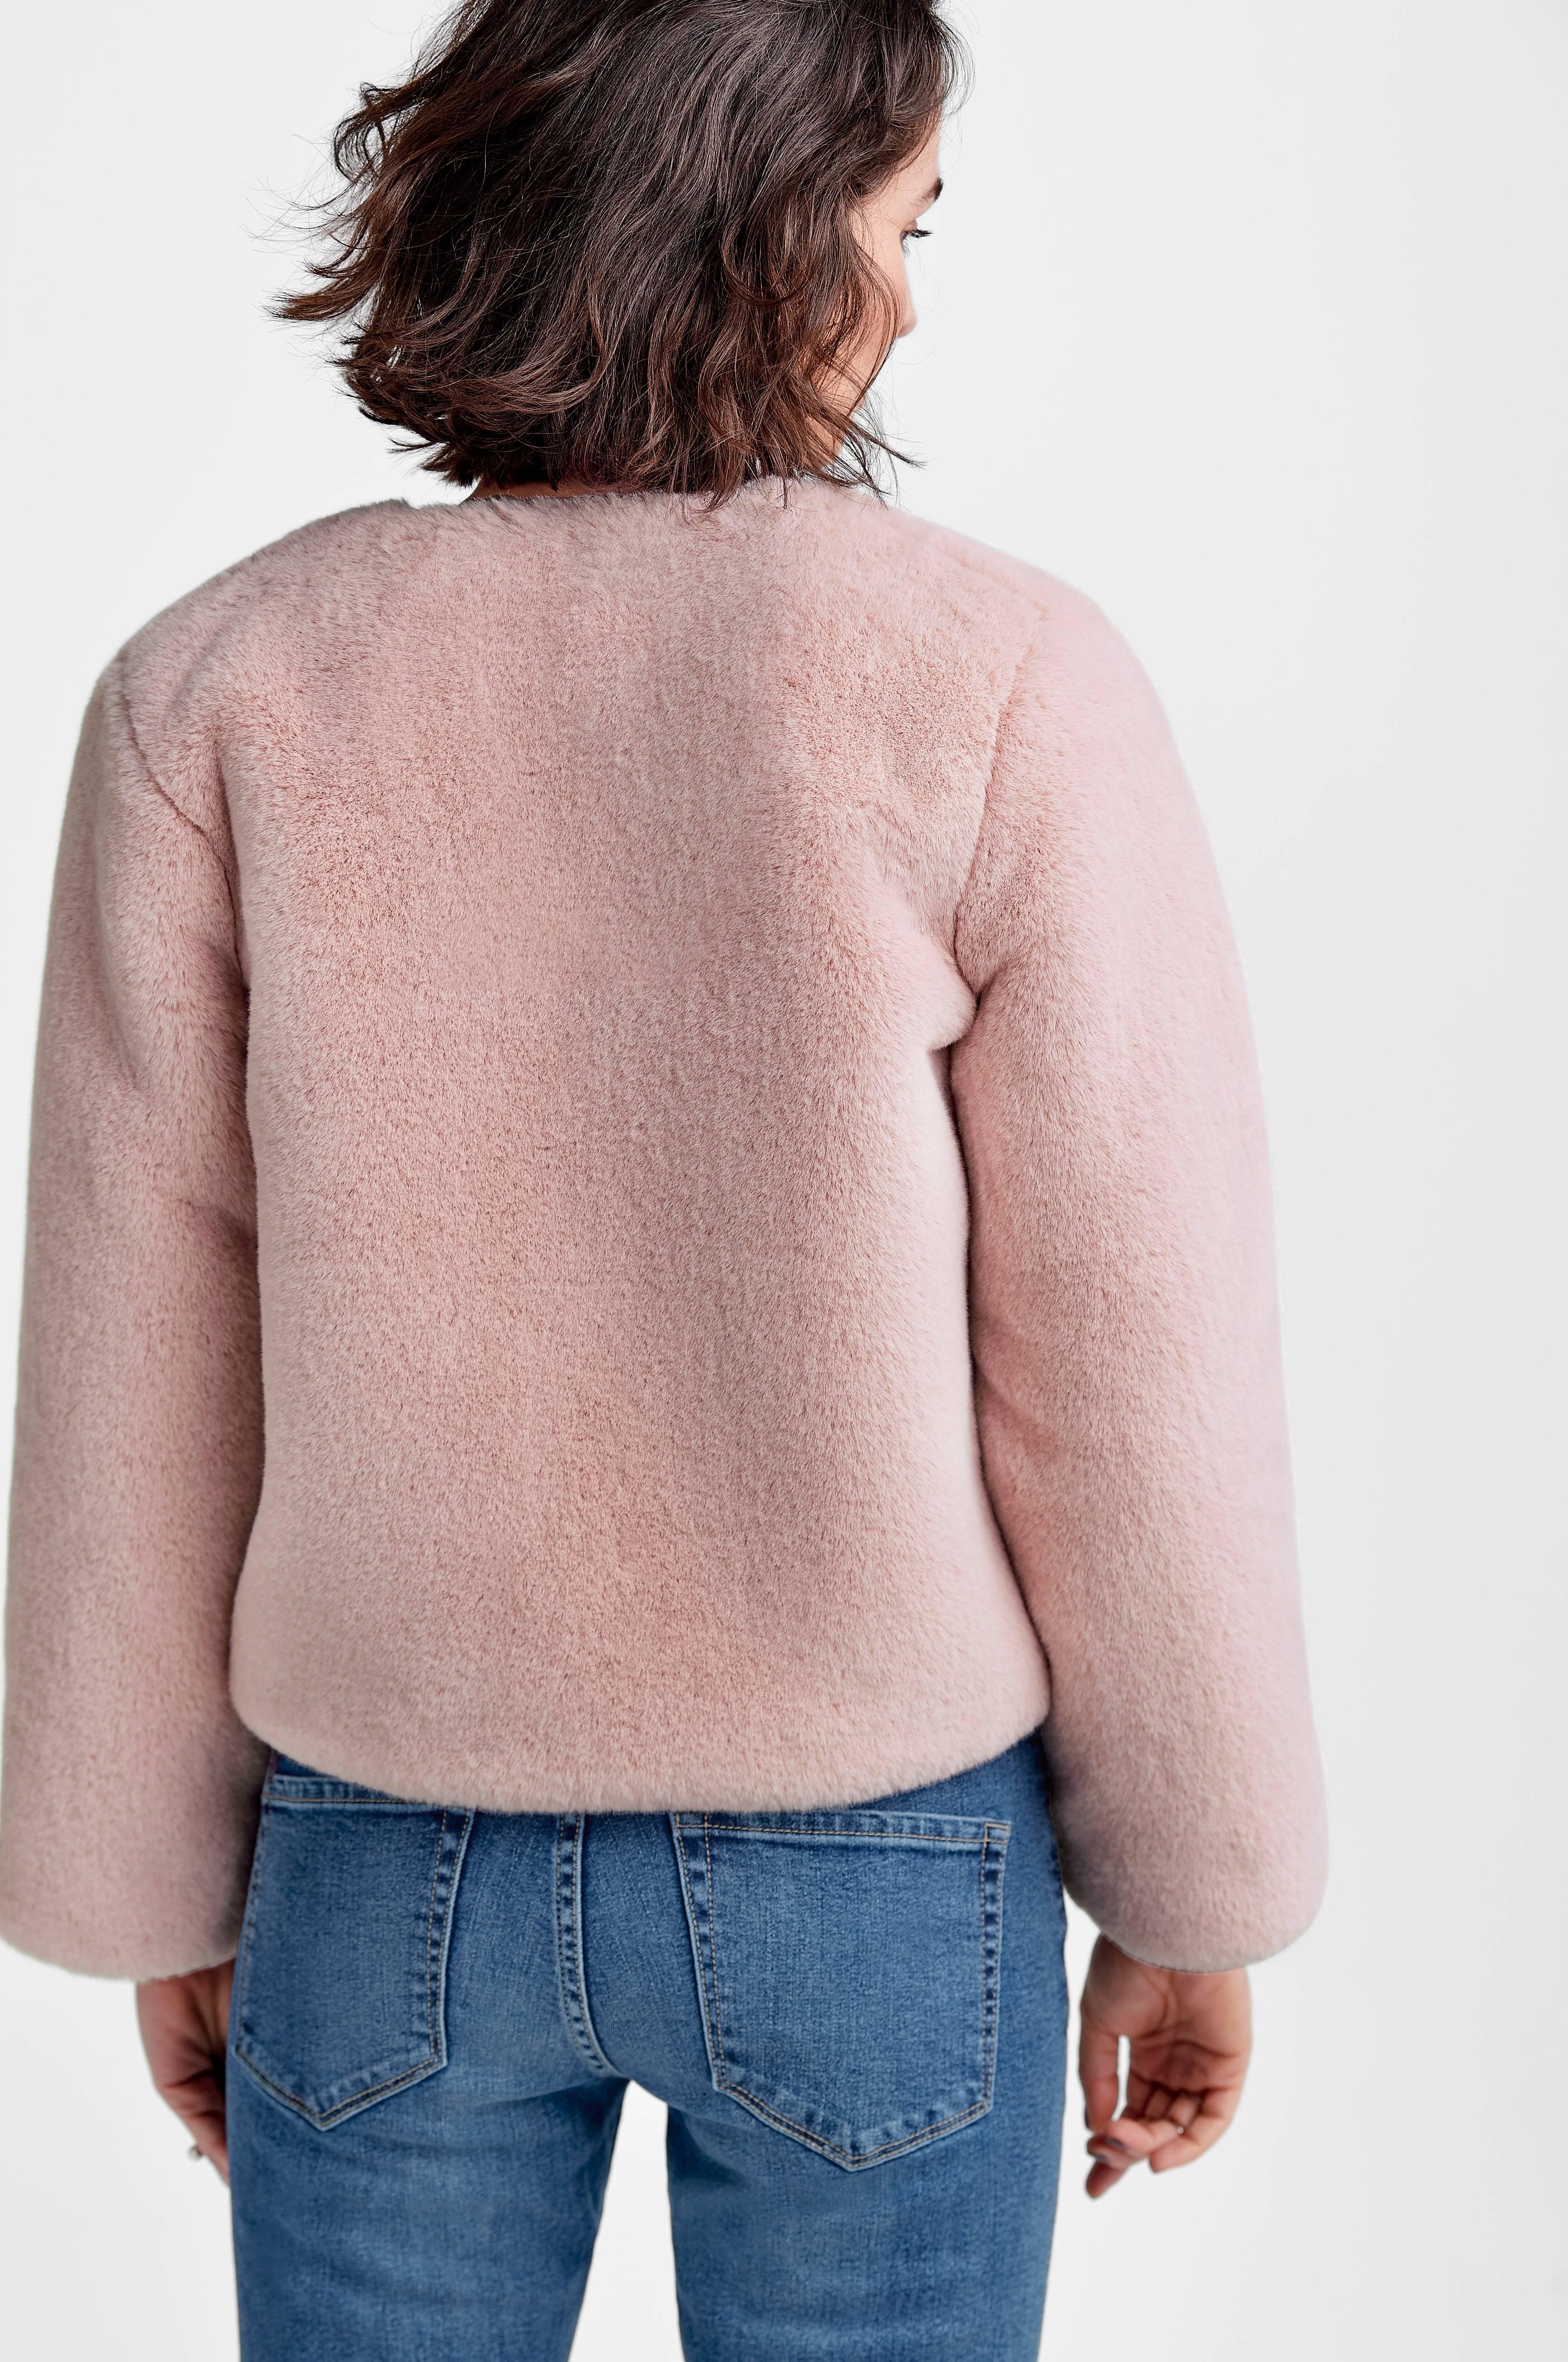 Ellos Collection Kort jakke i fuskepels Rosa Barn Ellos.no